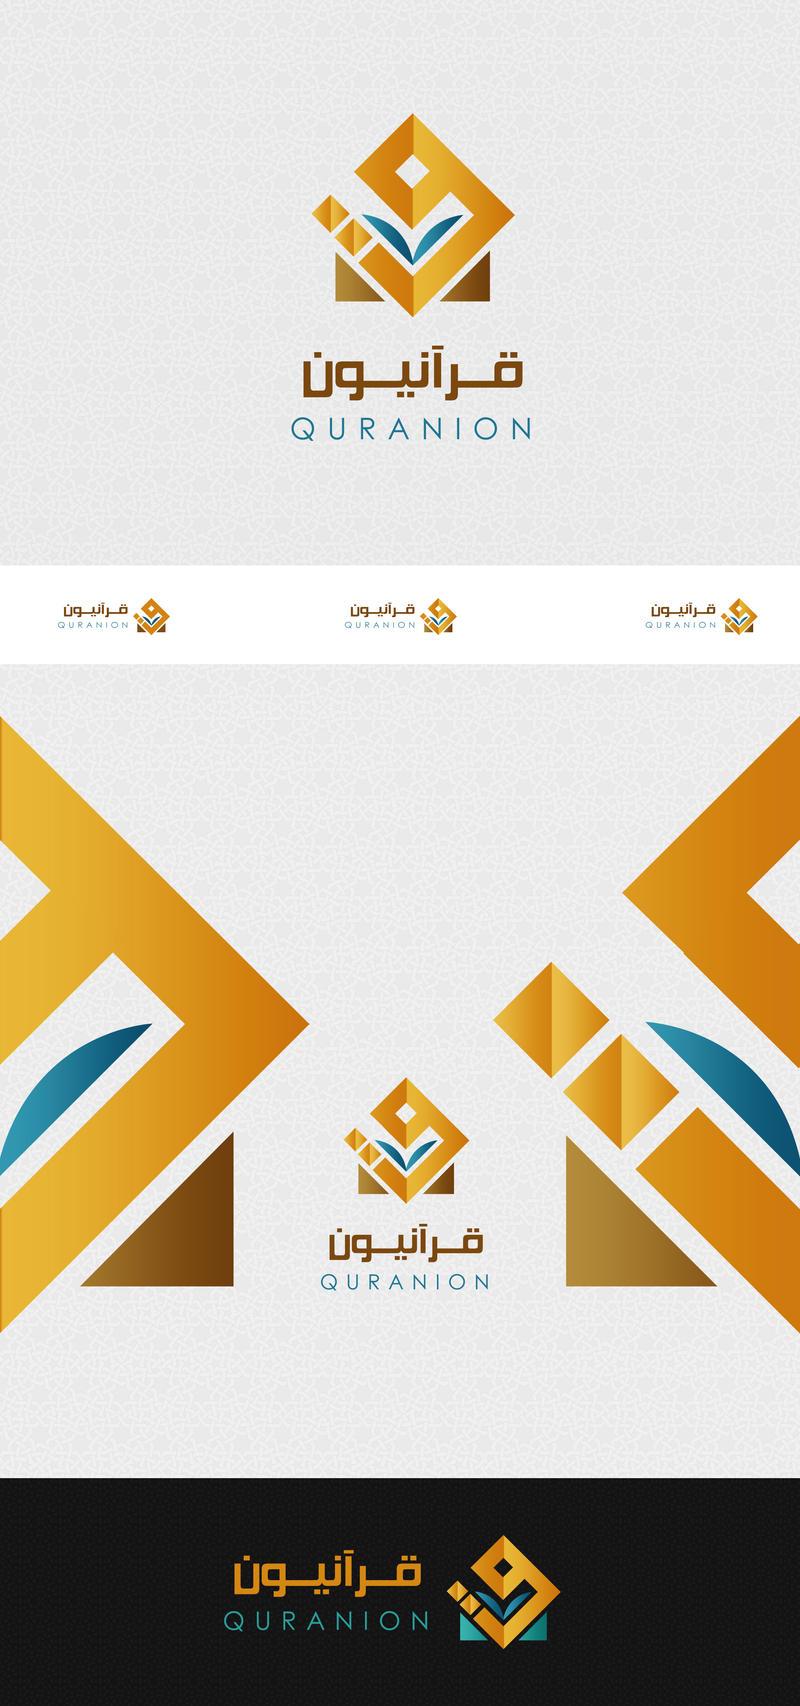 Quranion islamic Logo Design